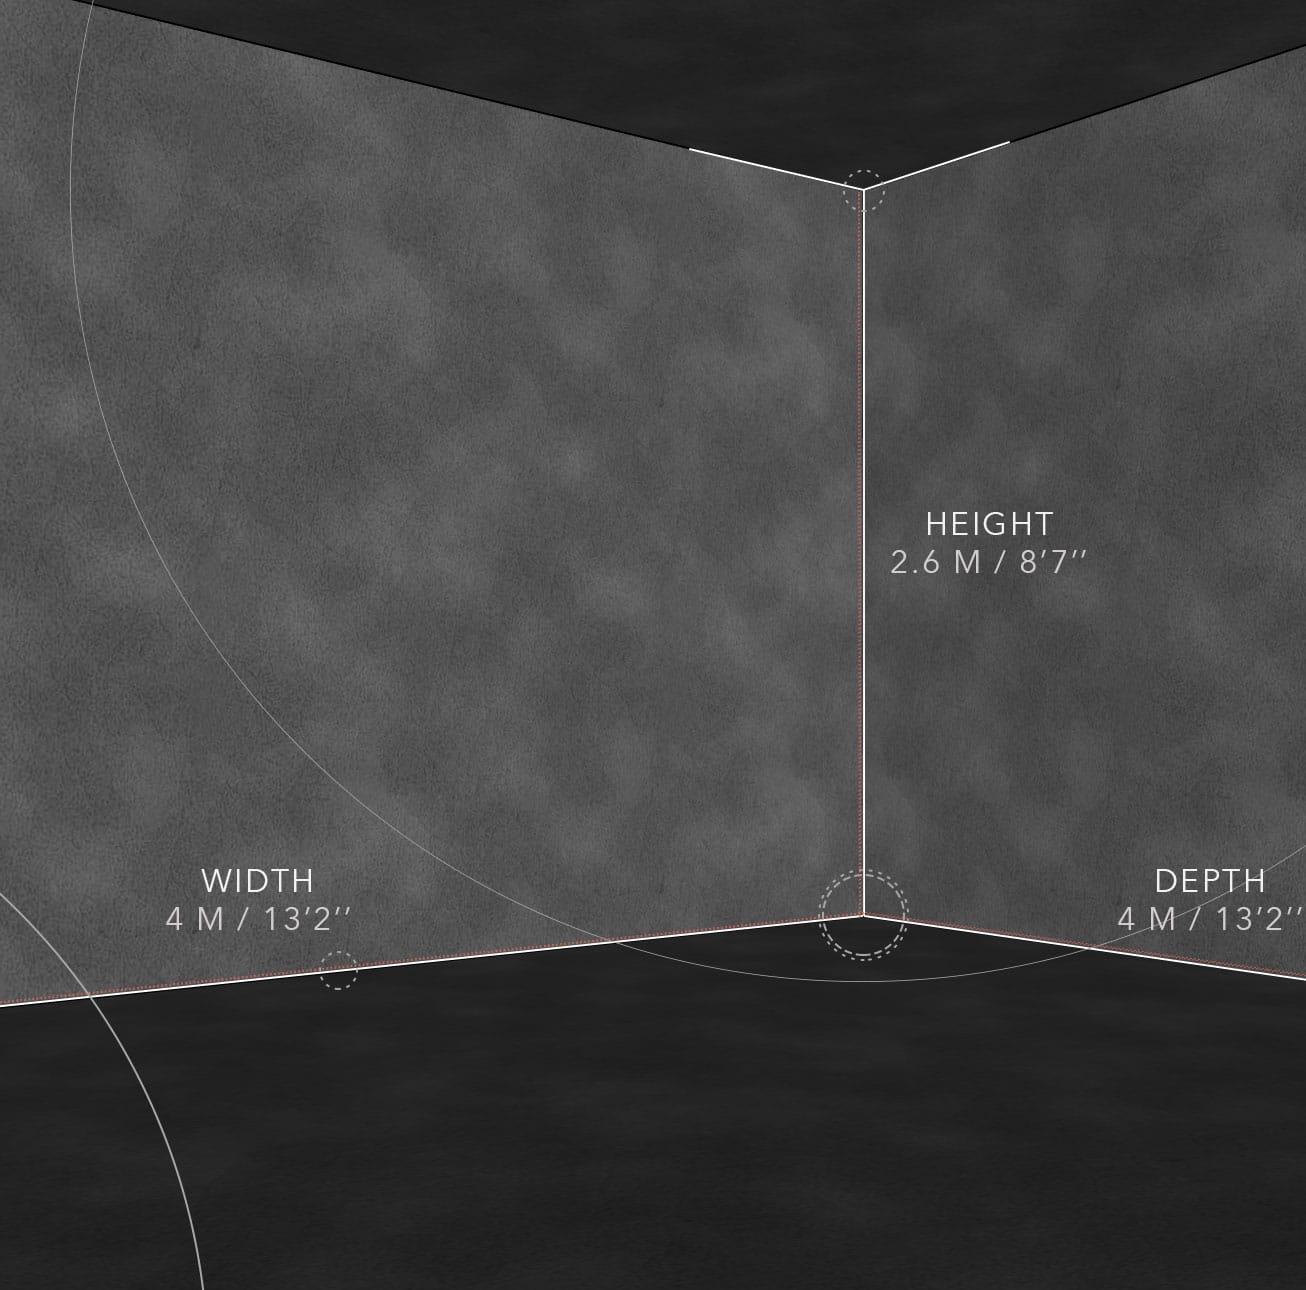 Shooting Simulator ST-2 Dimensions-CLASSIC